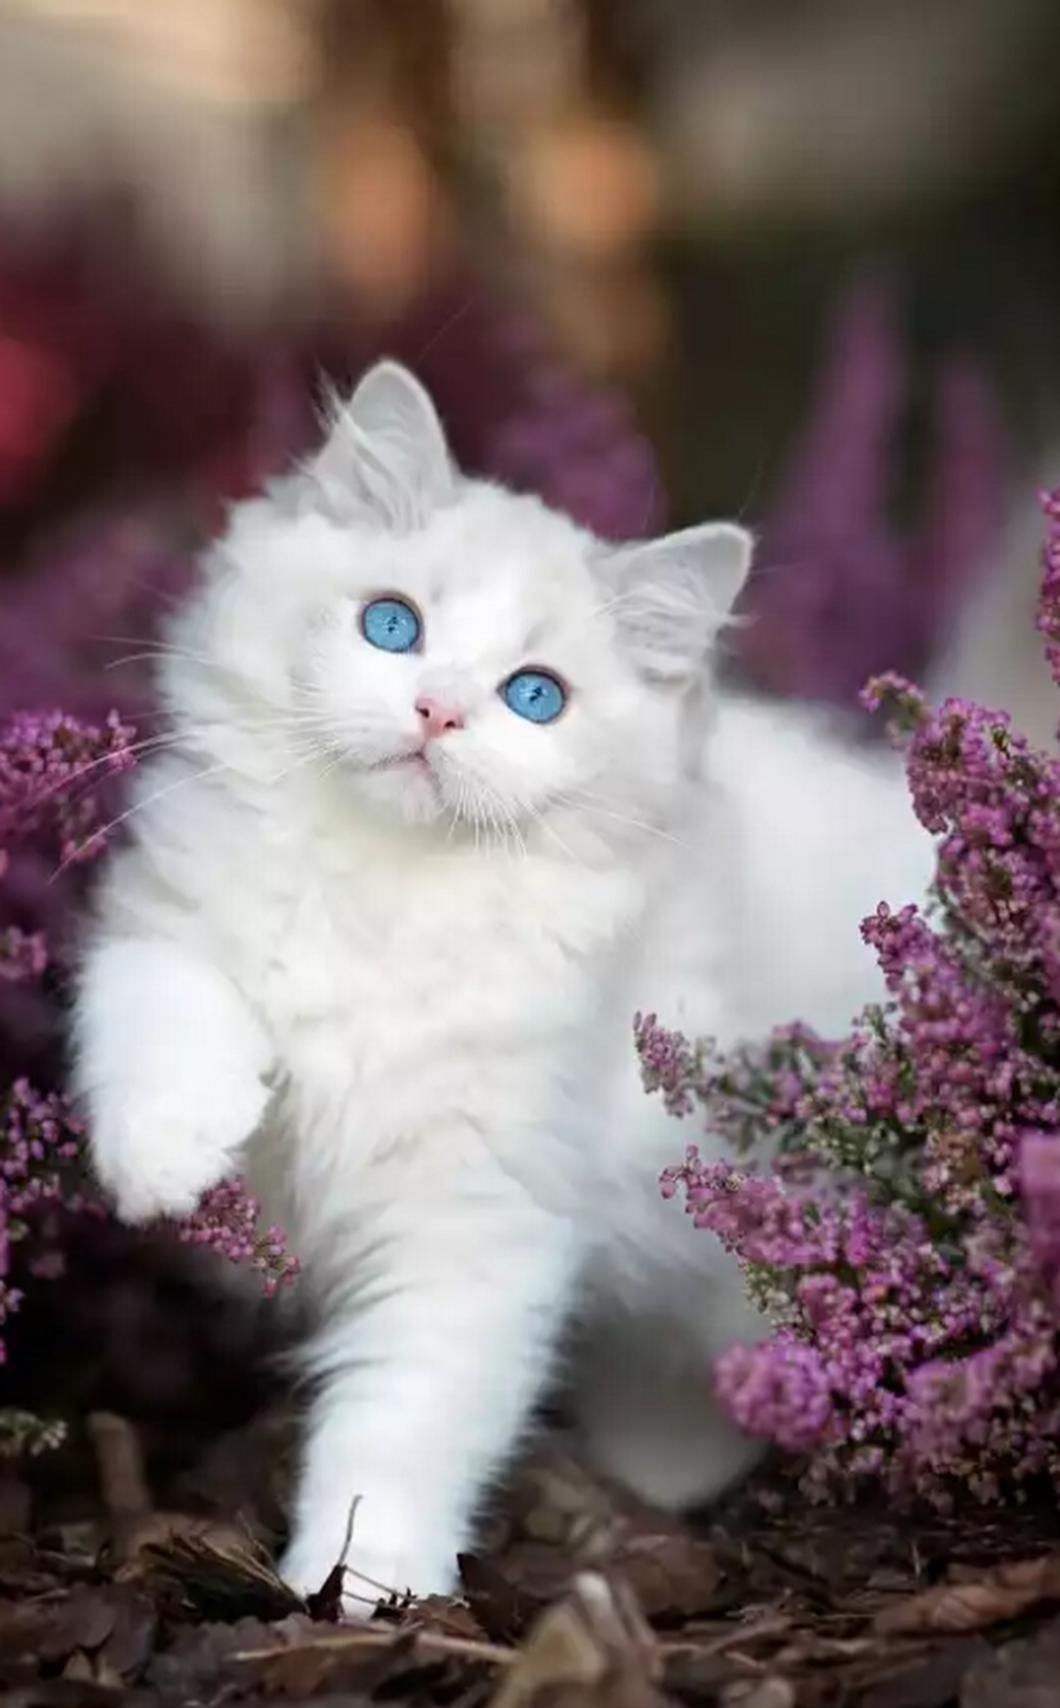 Adorable kitten with beautiful blue eyes Kittens cutest